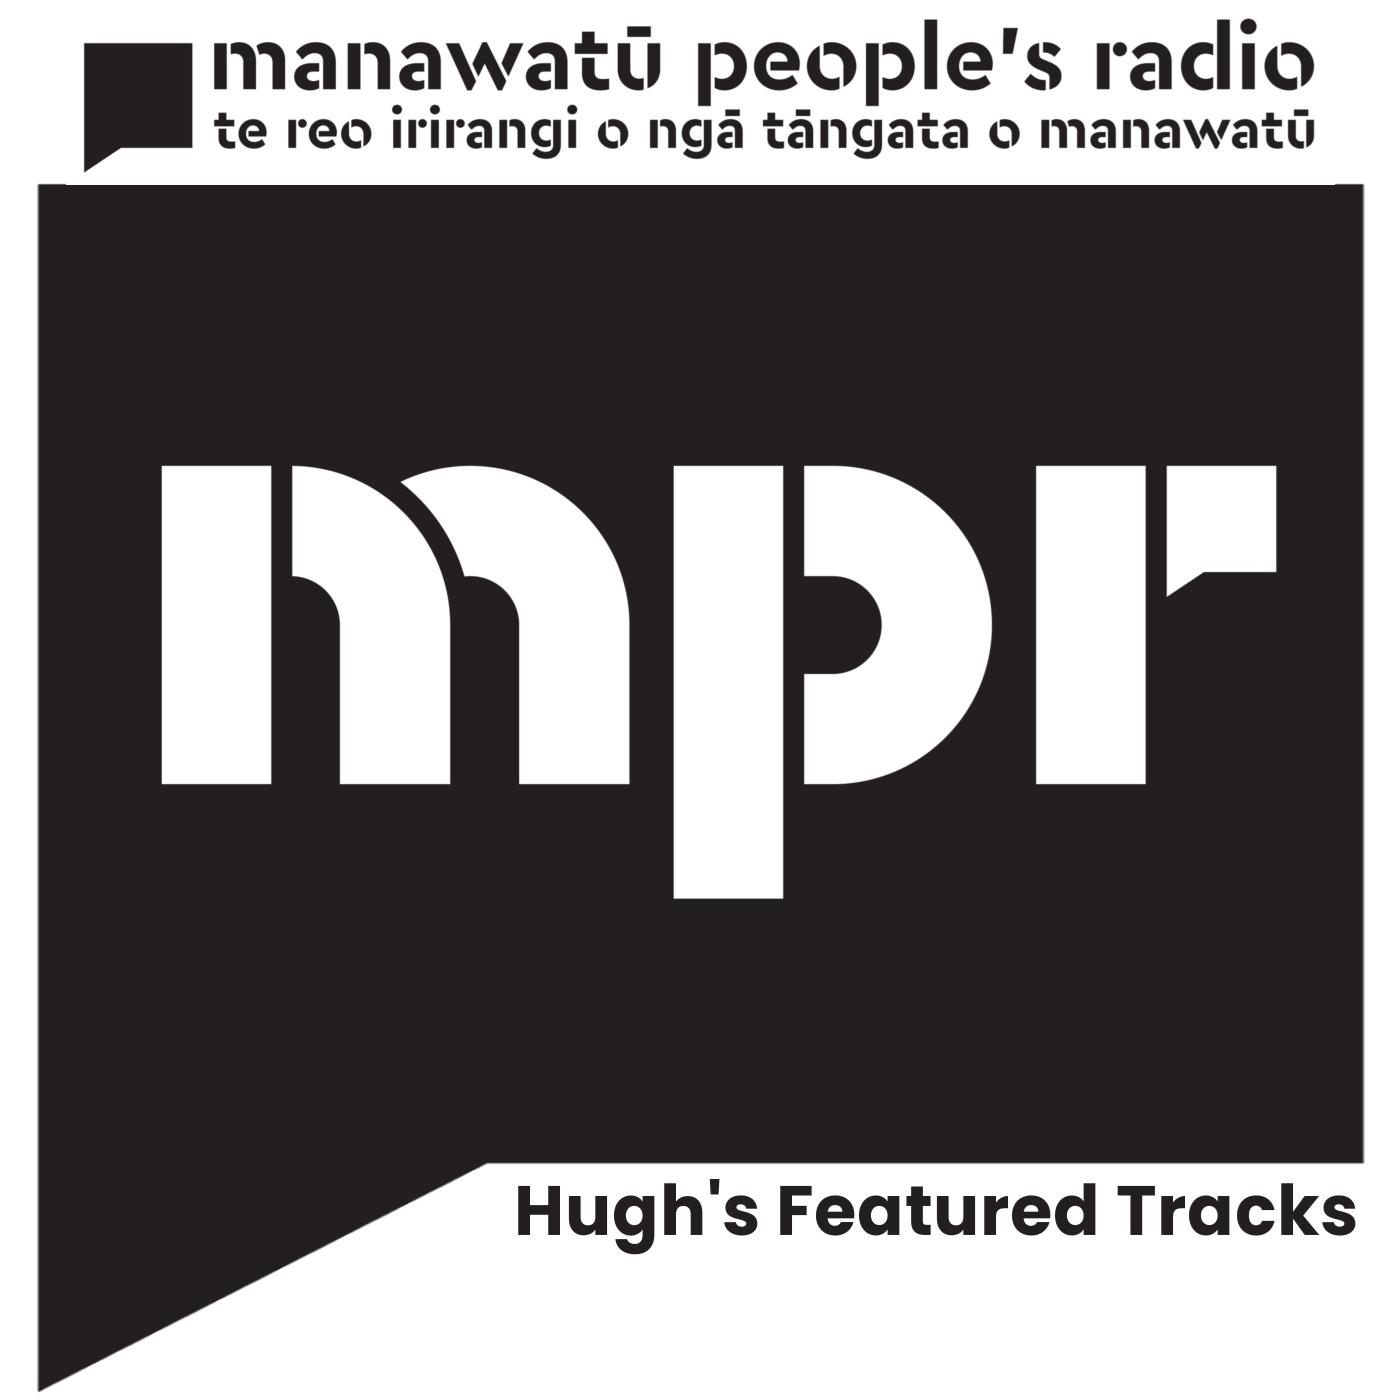 Hugh's Featured Tracks 20-07-2018